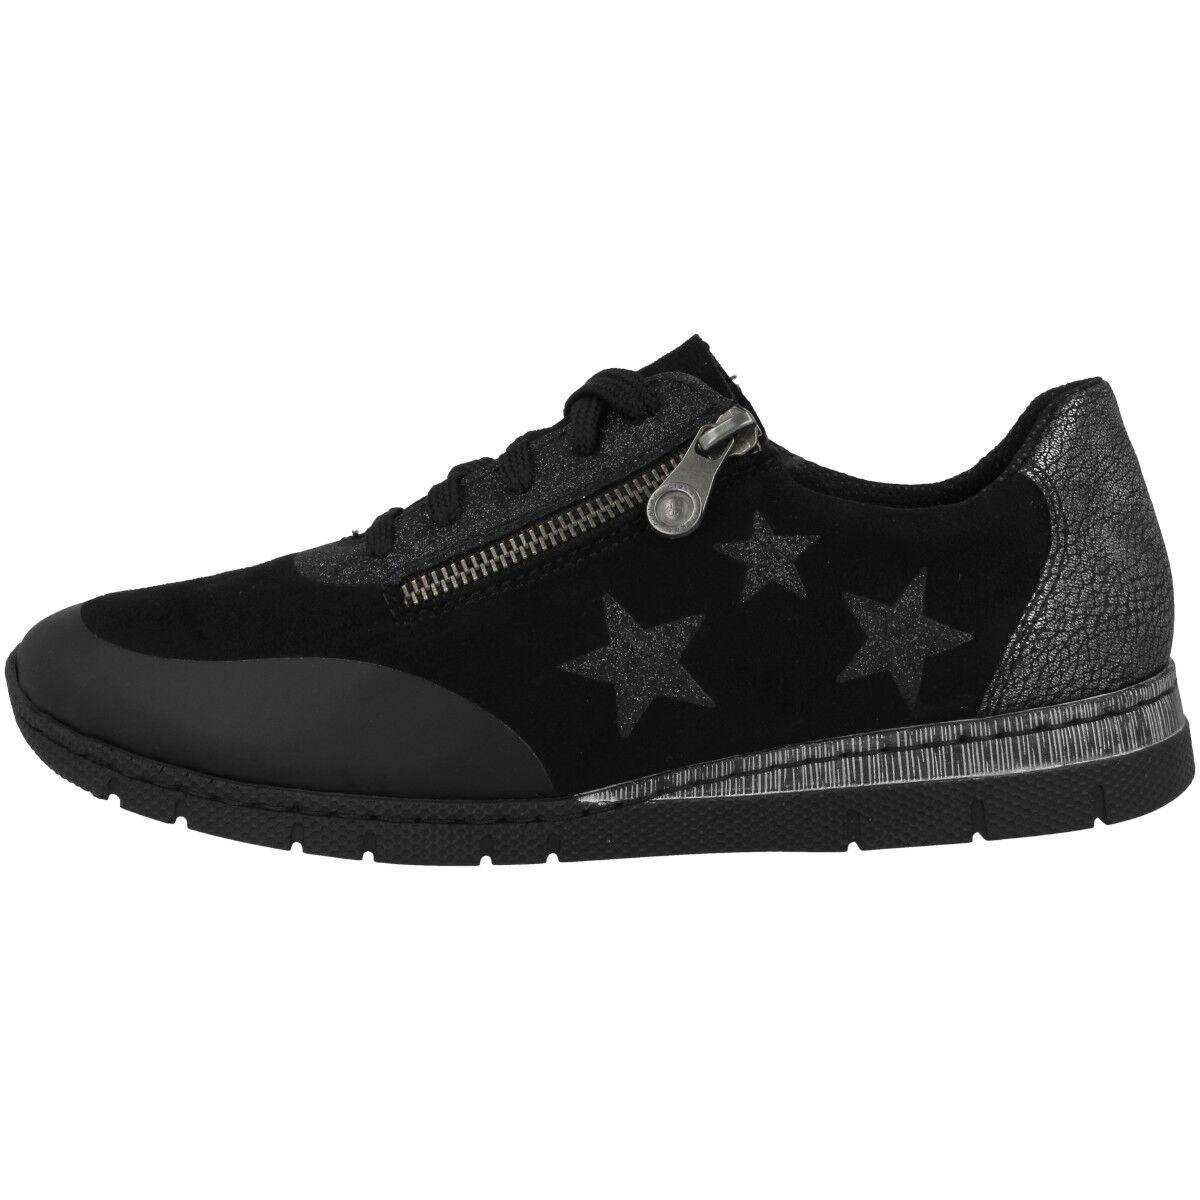 Rieker foil-microstretch-glitterfoil Zapatos señora anti estrés cortos n5322-02